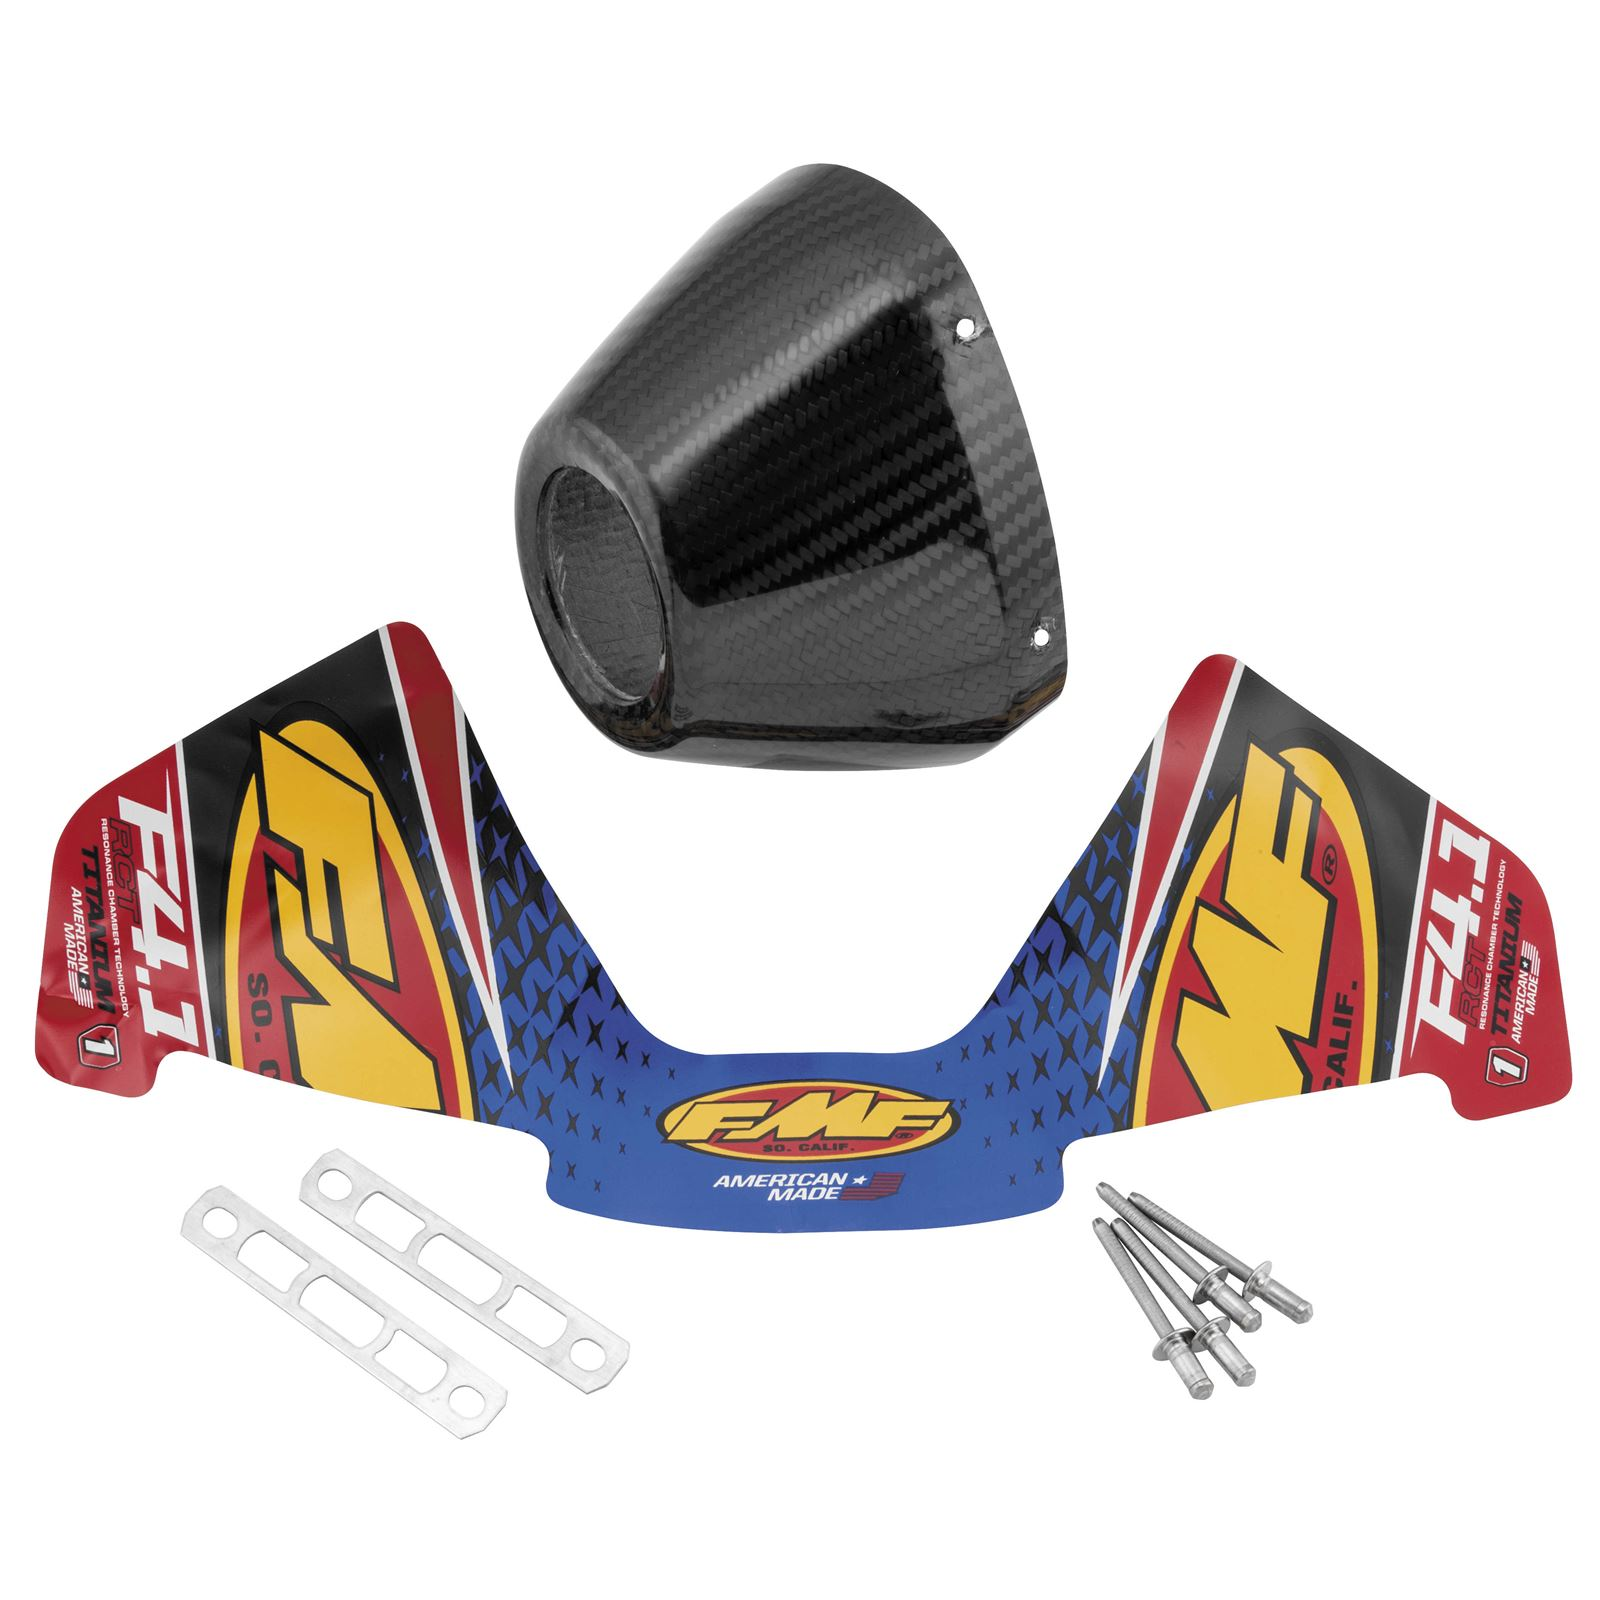 FMF Racing Factory 4.1 End Caps